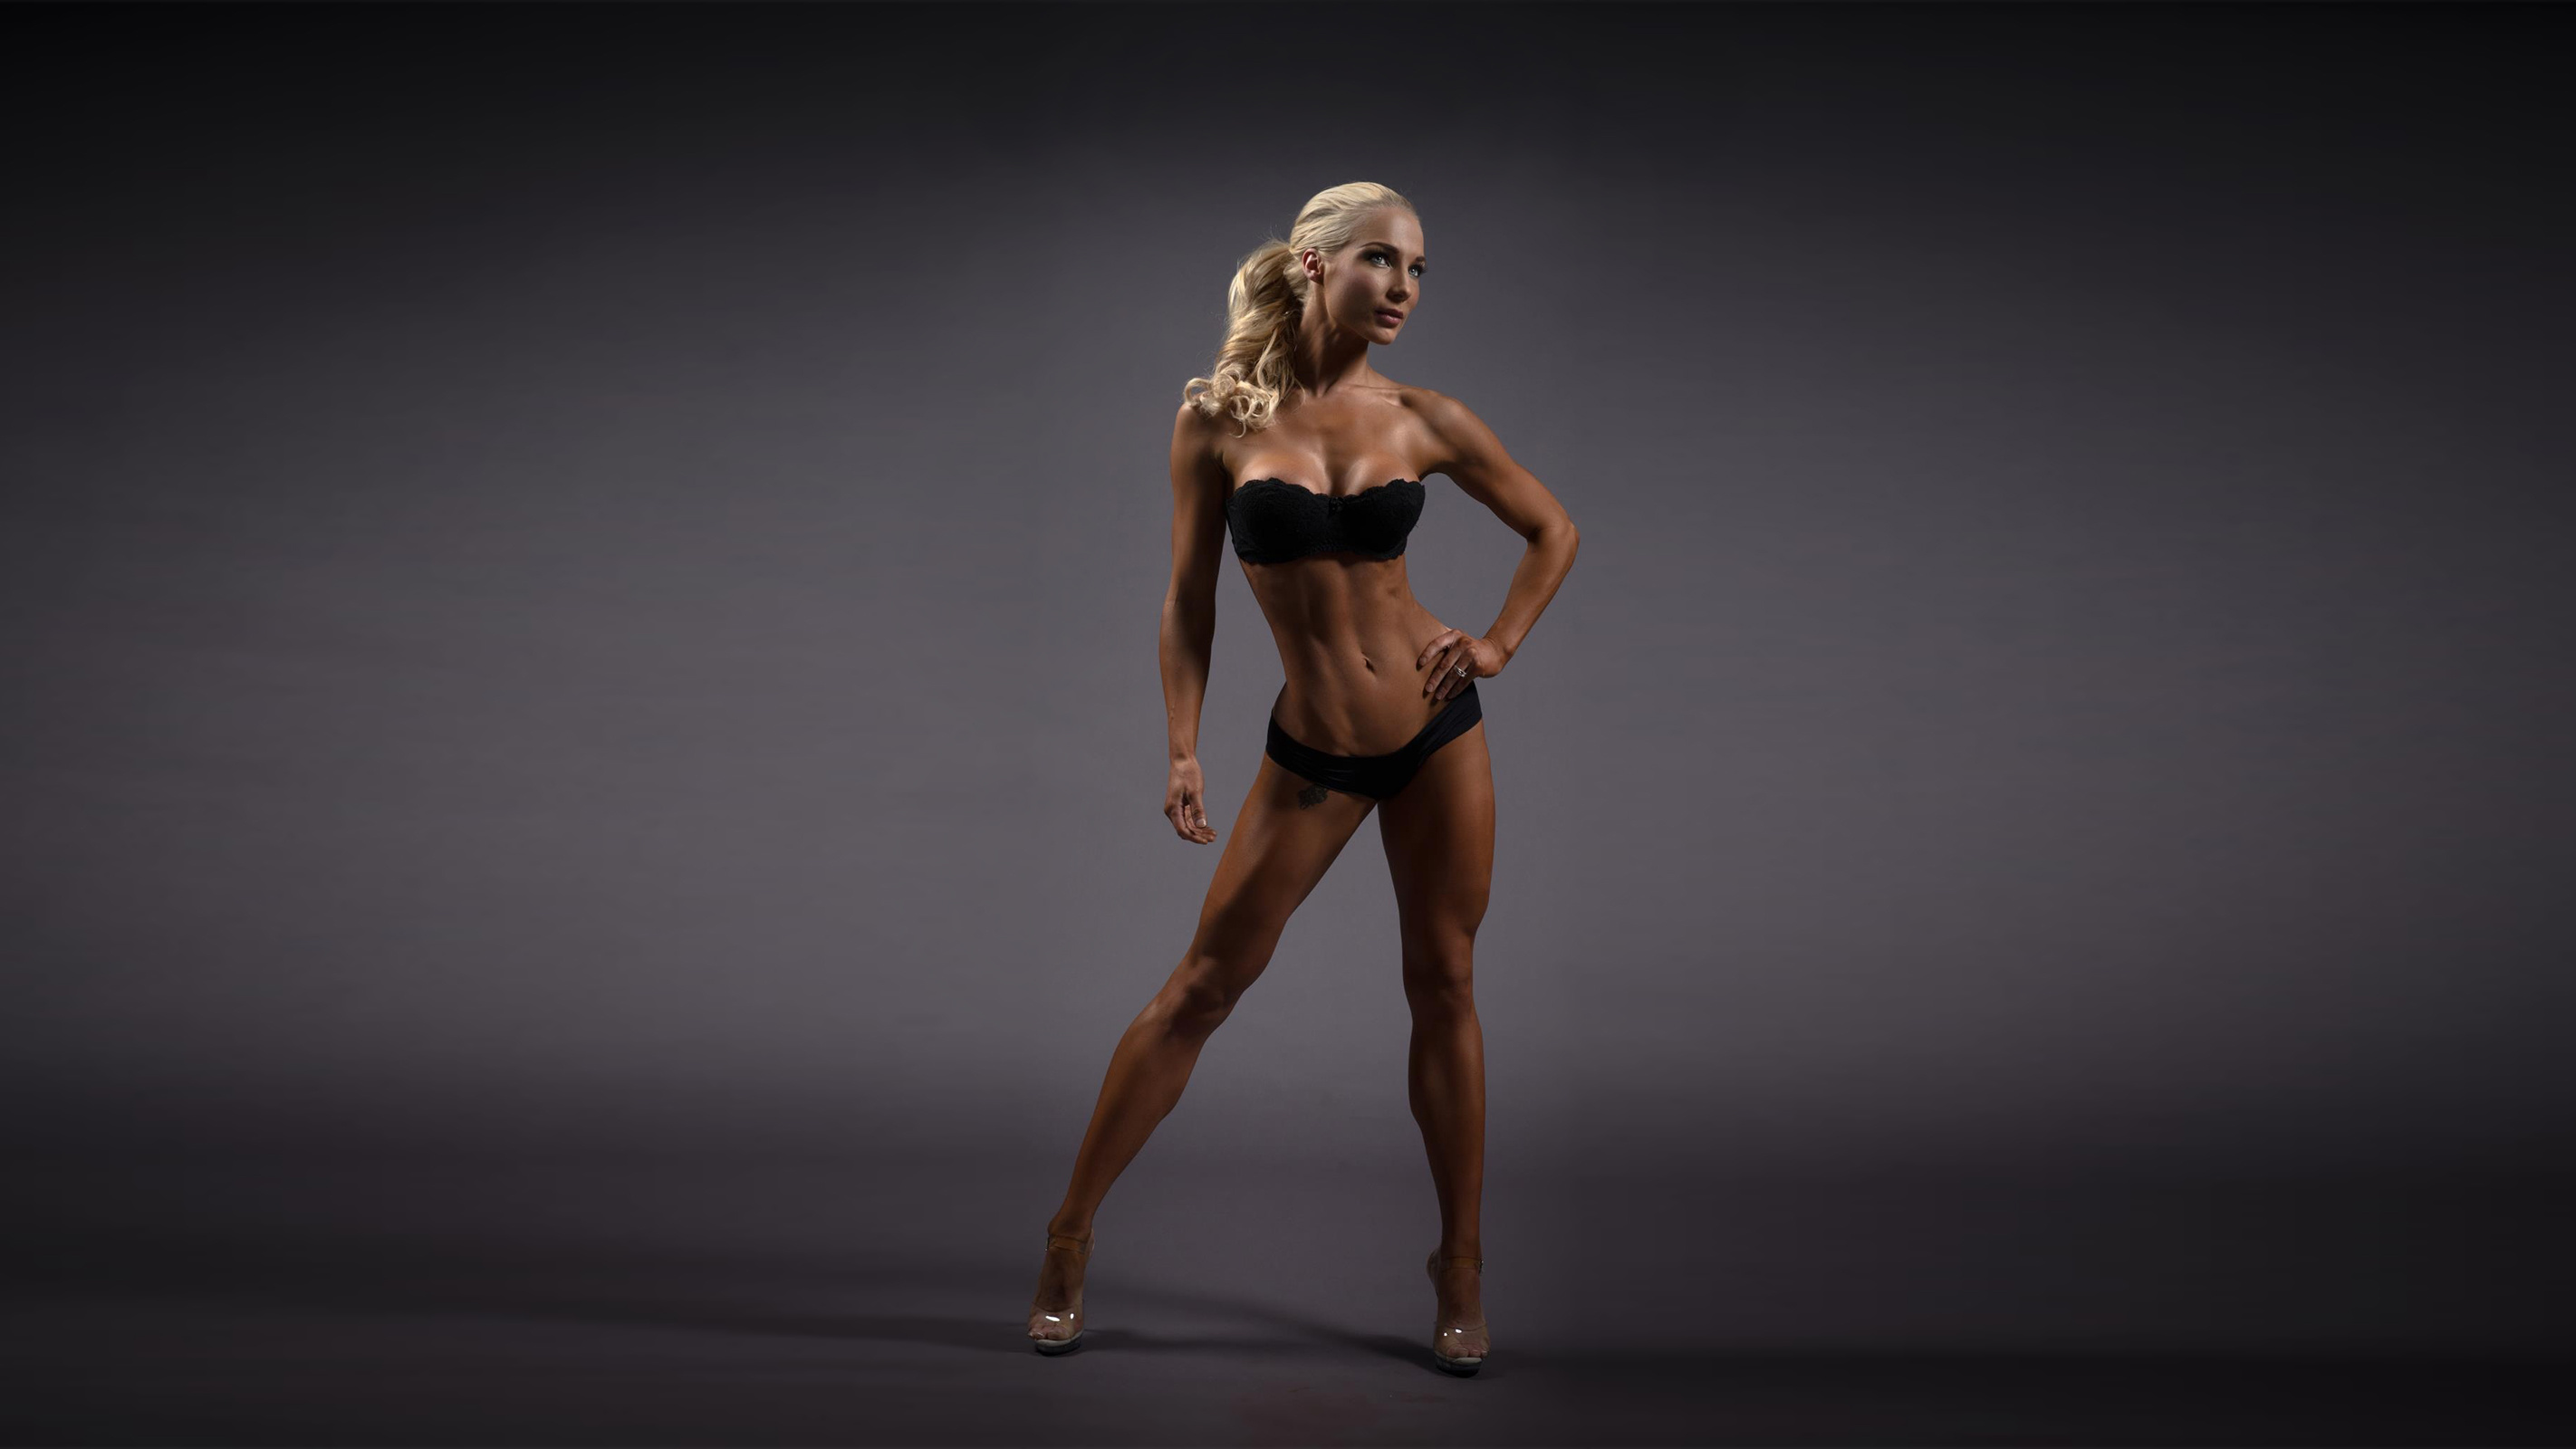 download photo 1920x1080 blonde athletic heels